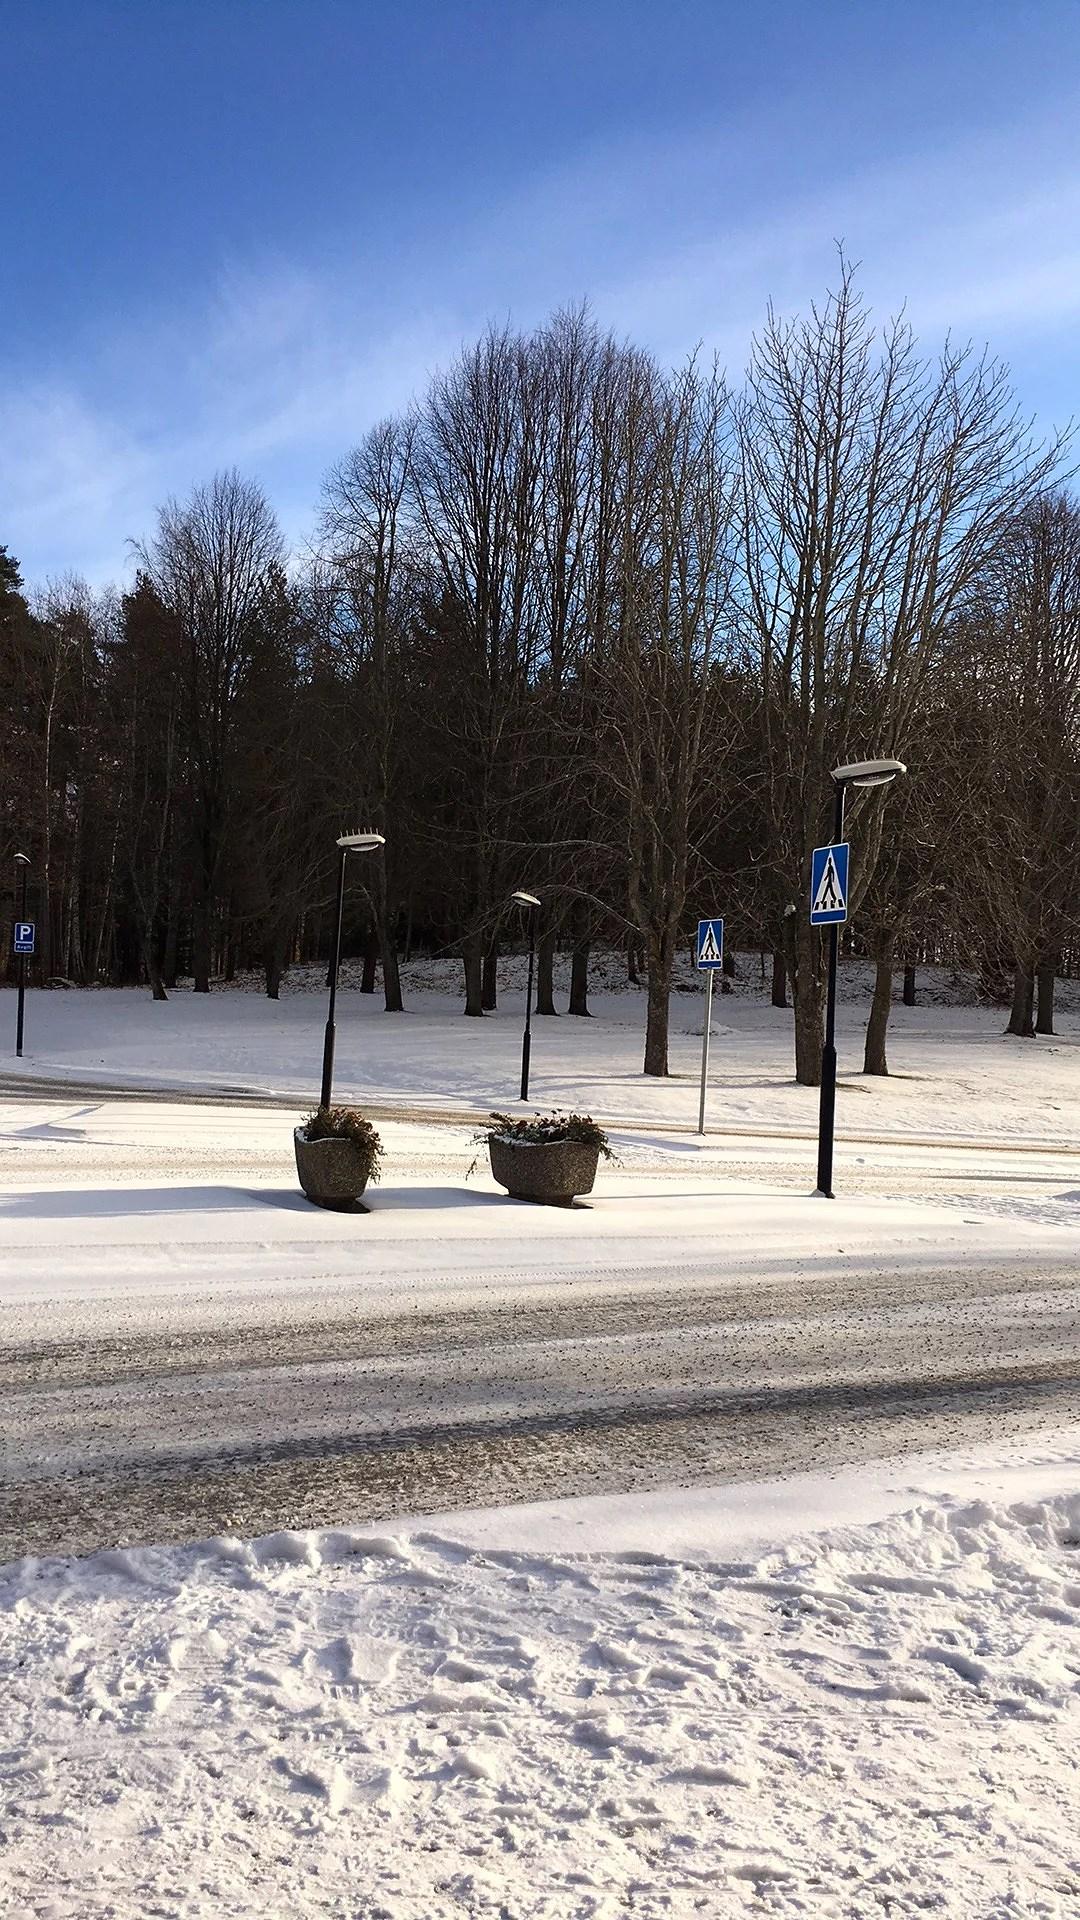 Det har blivit vinter